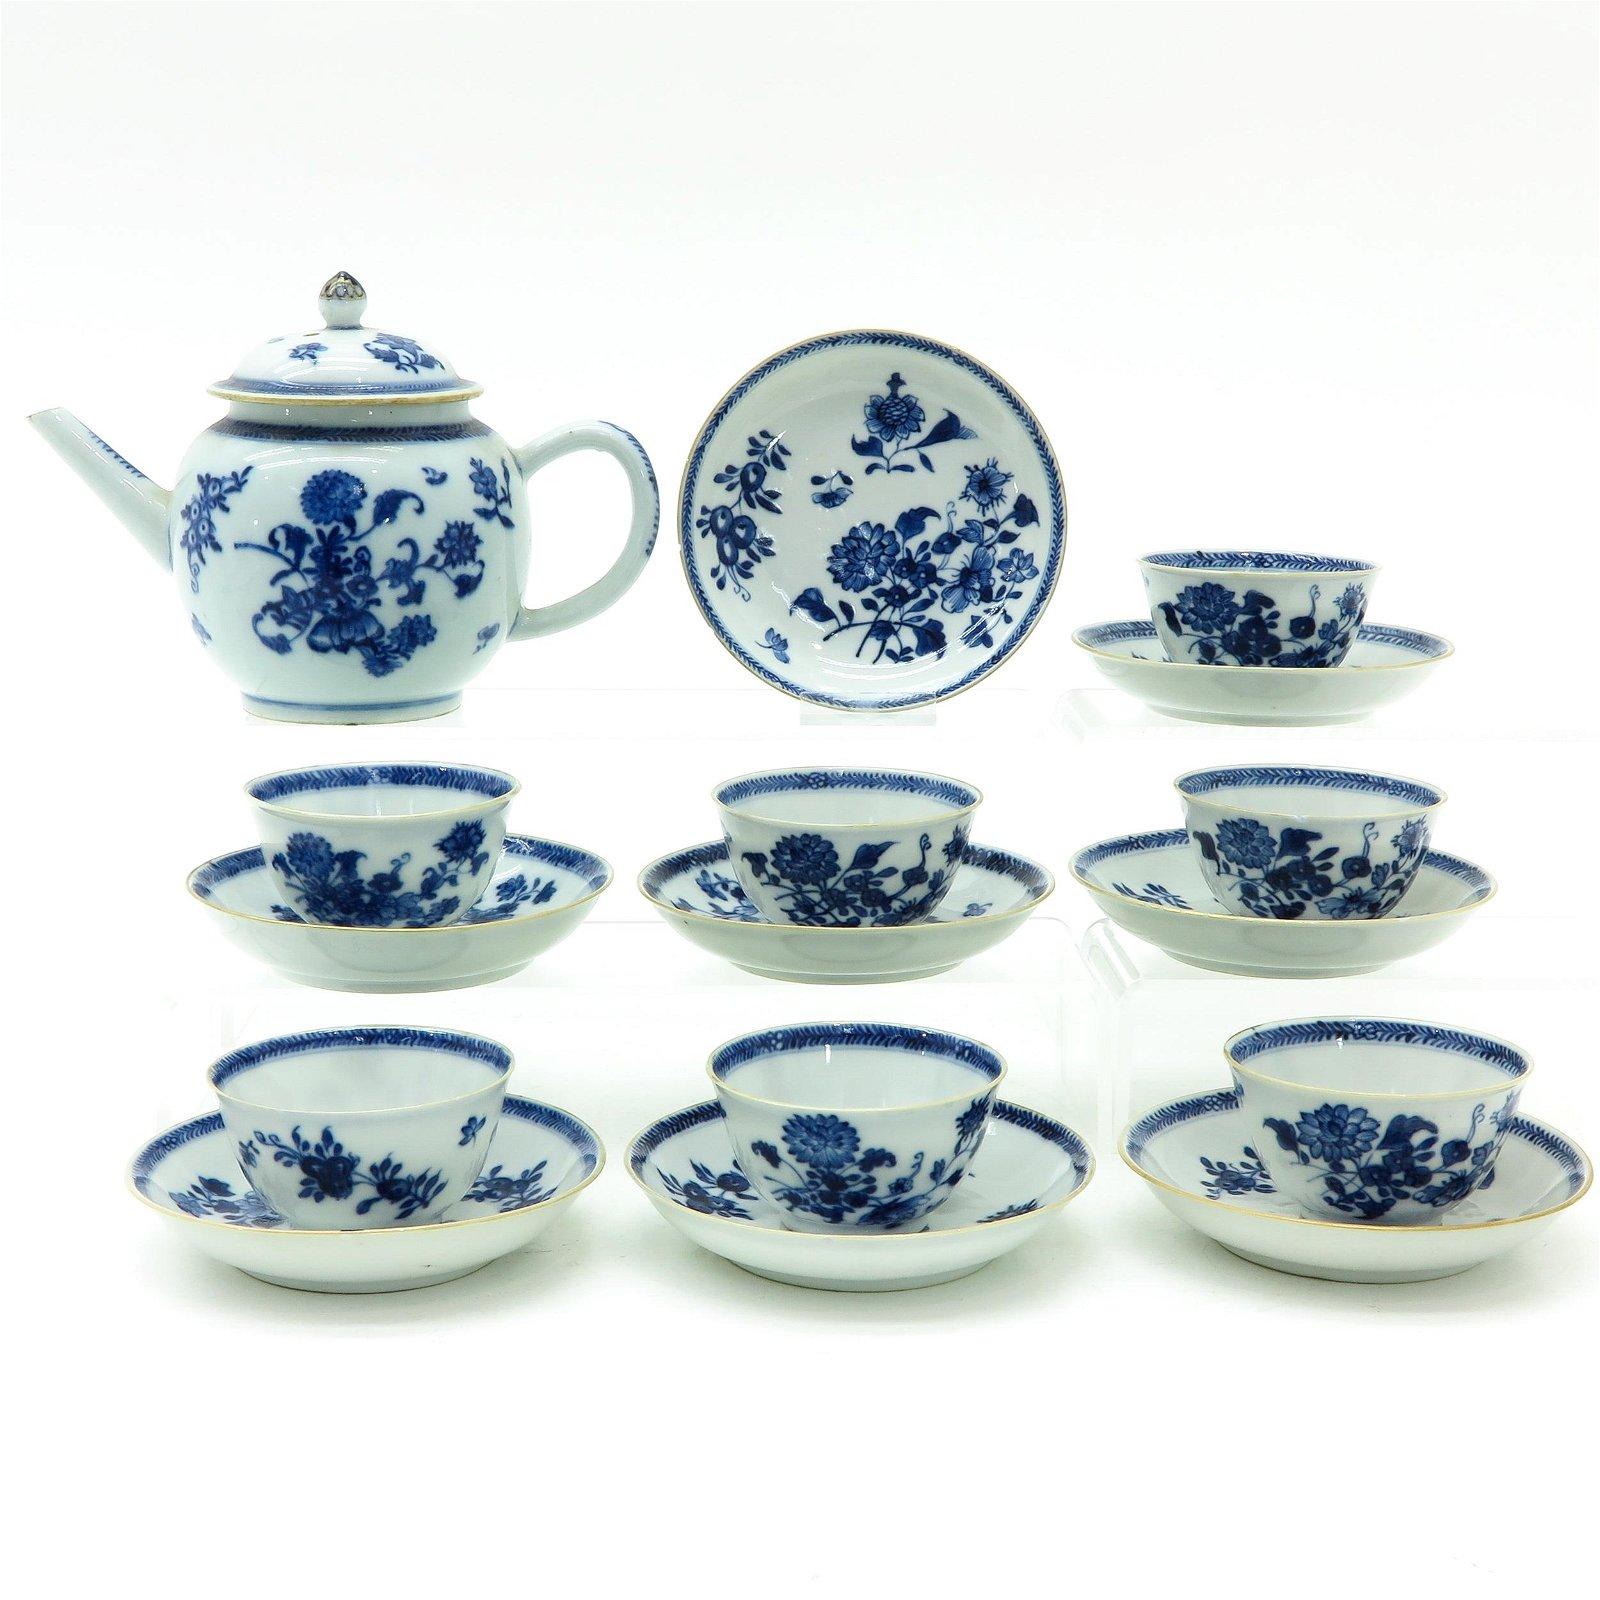 A Chinese Porcelain Tea Service